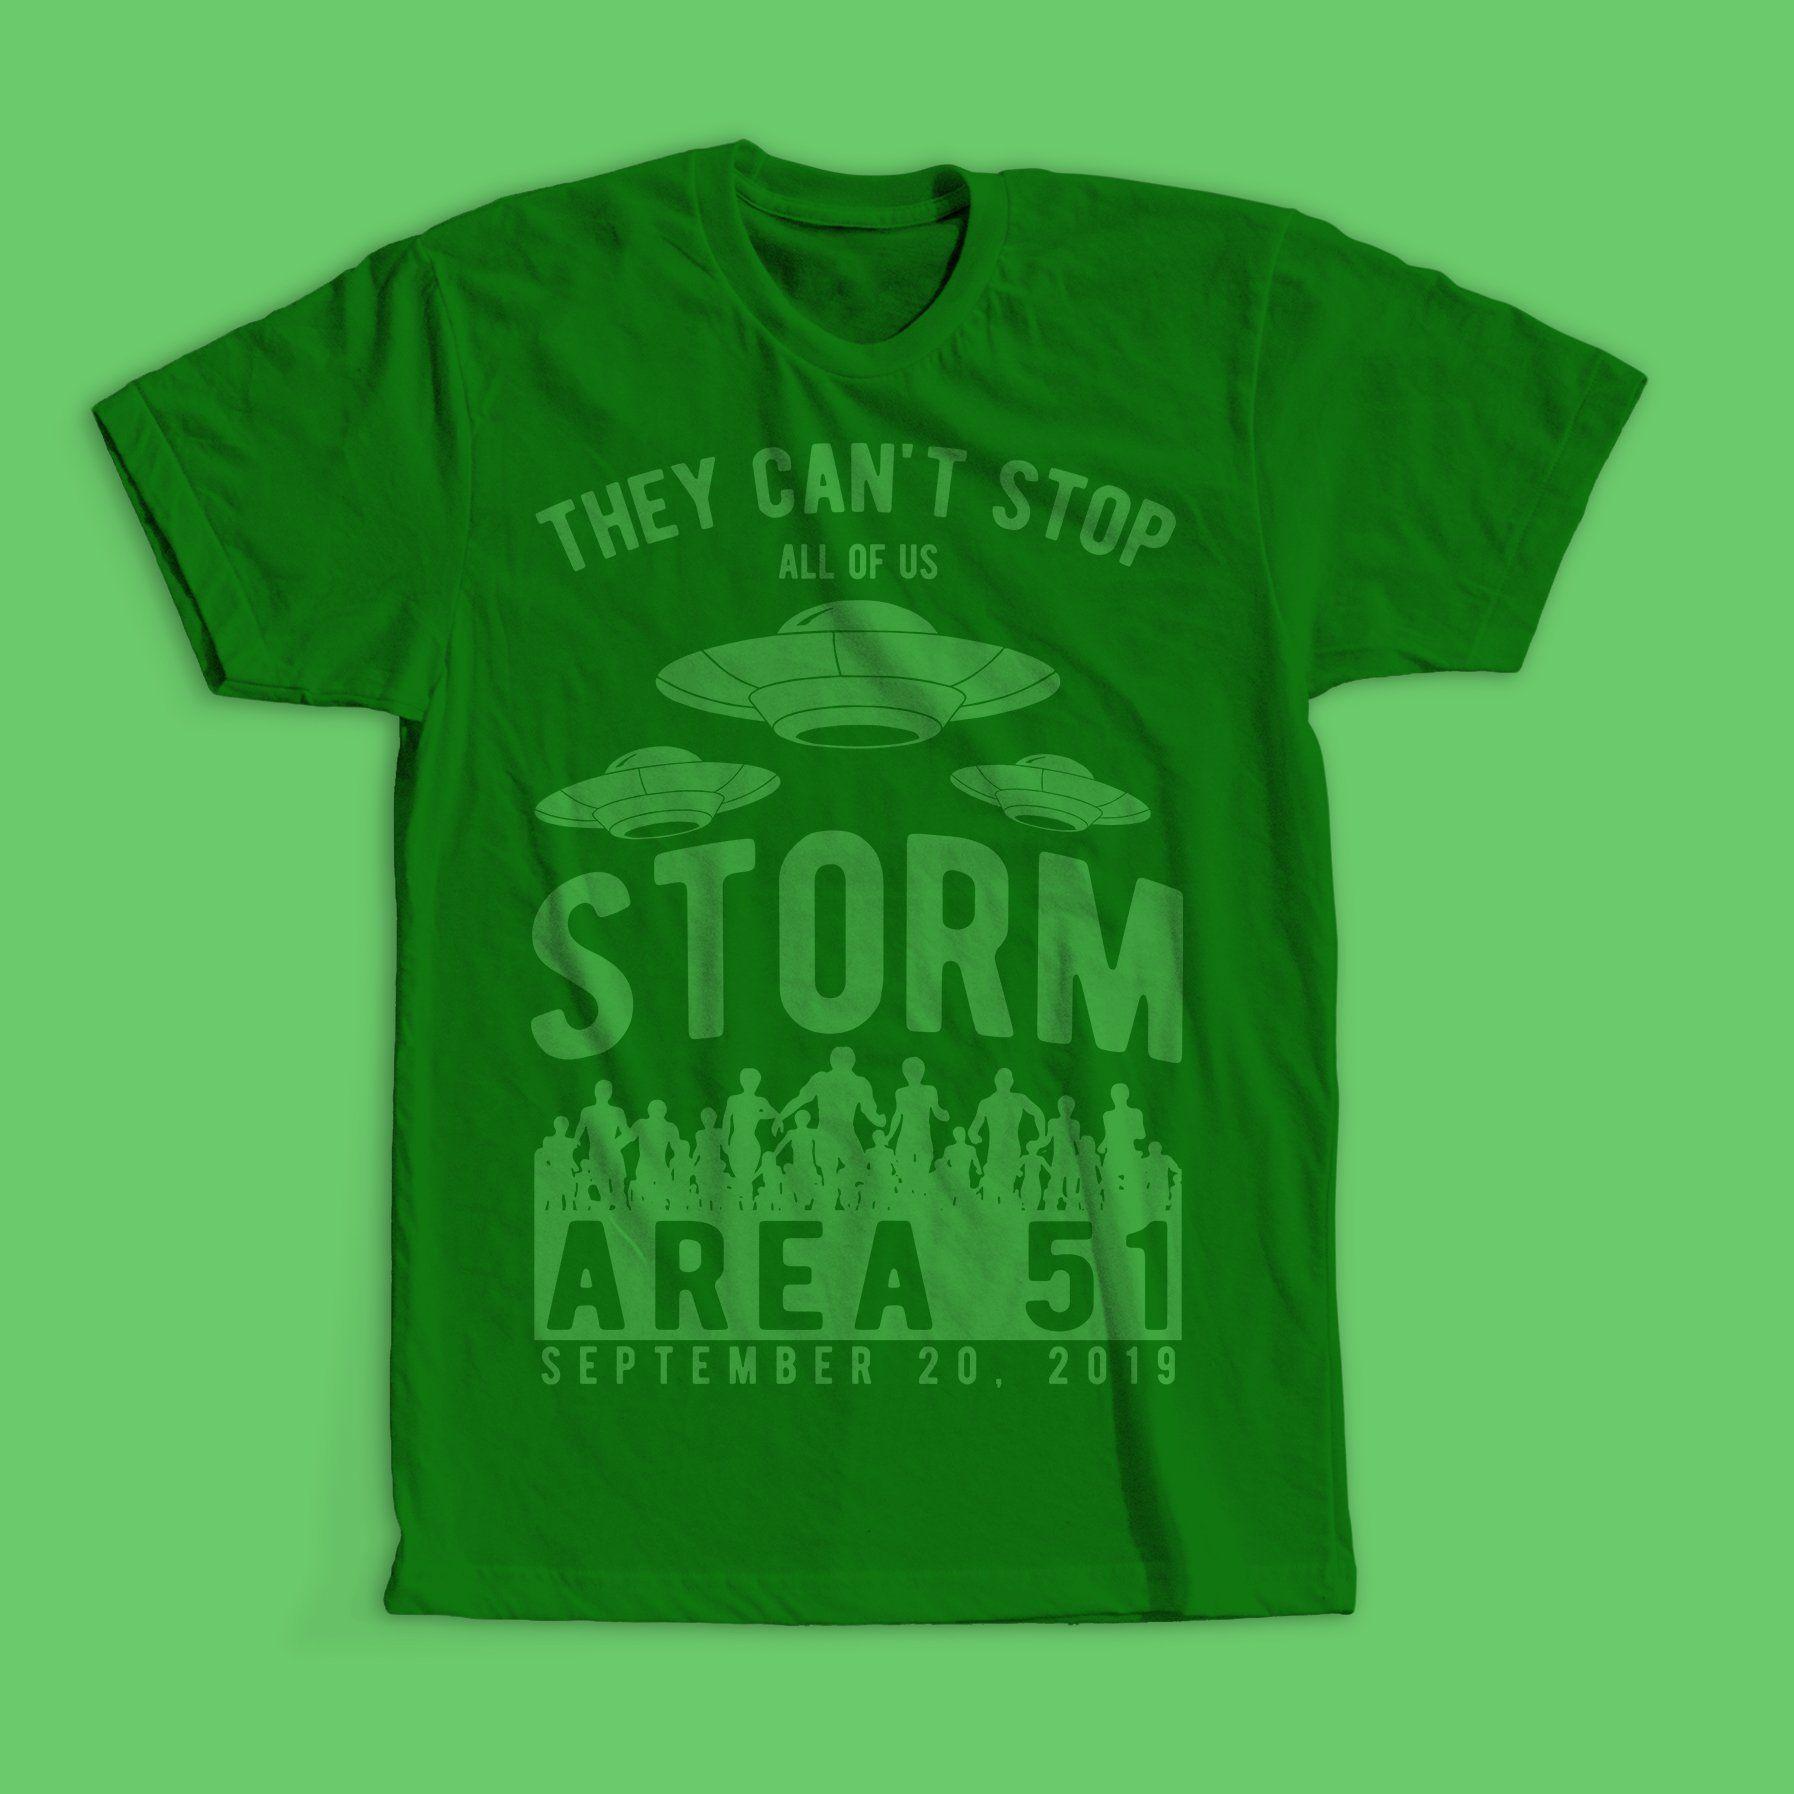 Storm Area 51 T Shirt Design Tshirt Designs Shirt Designs Shirts